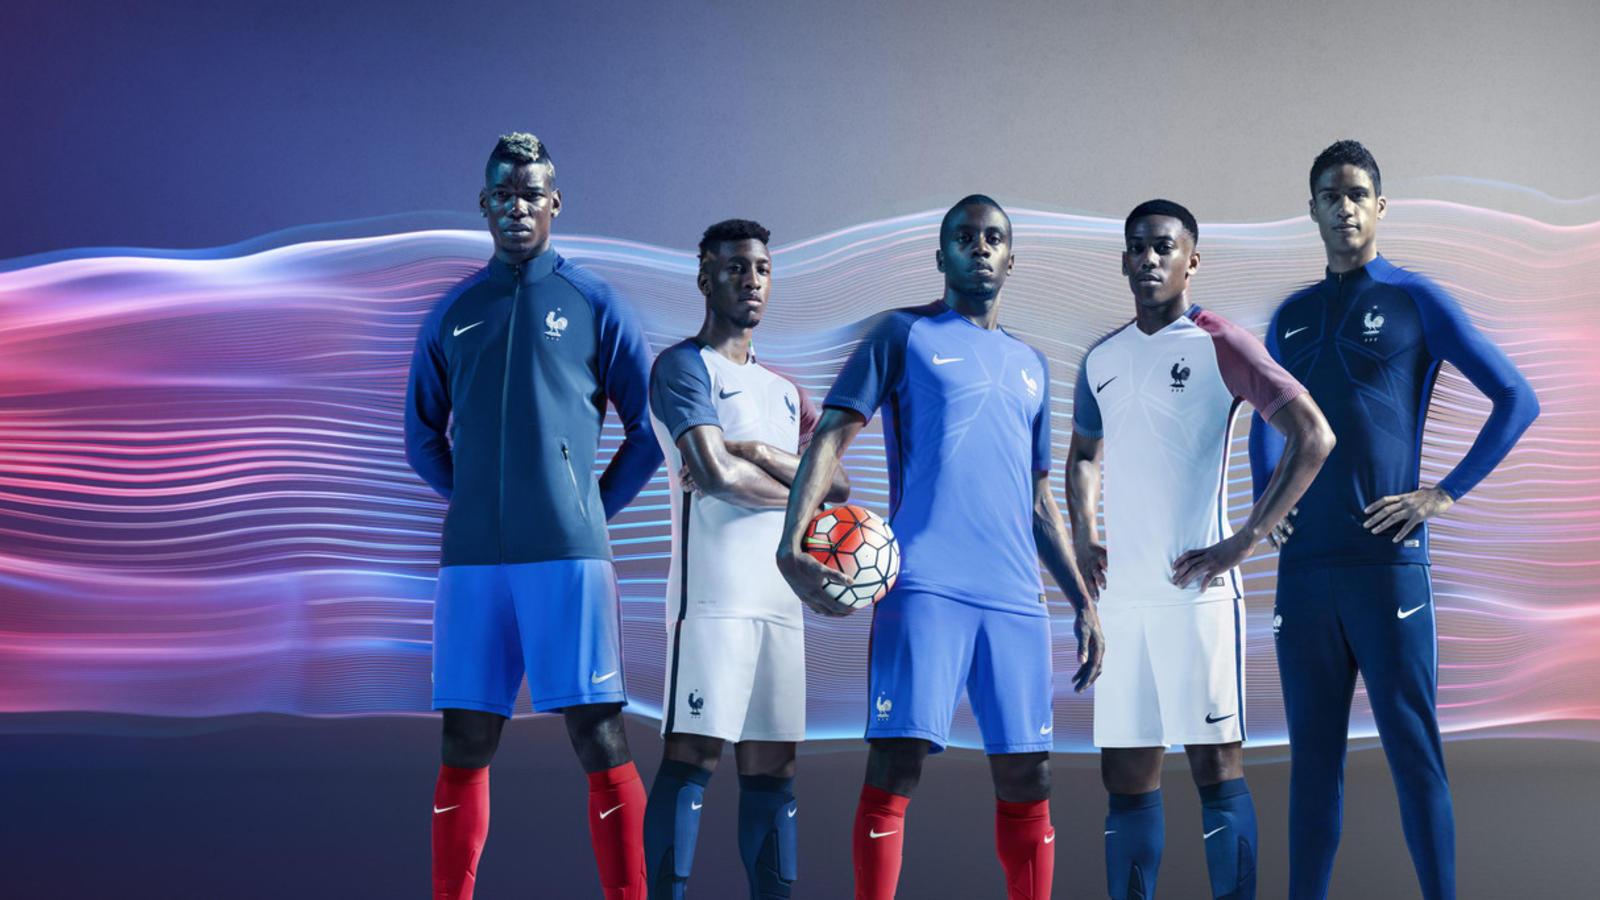 Wallpaper de jugadores de francia campeon de mundial futbol